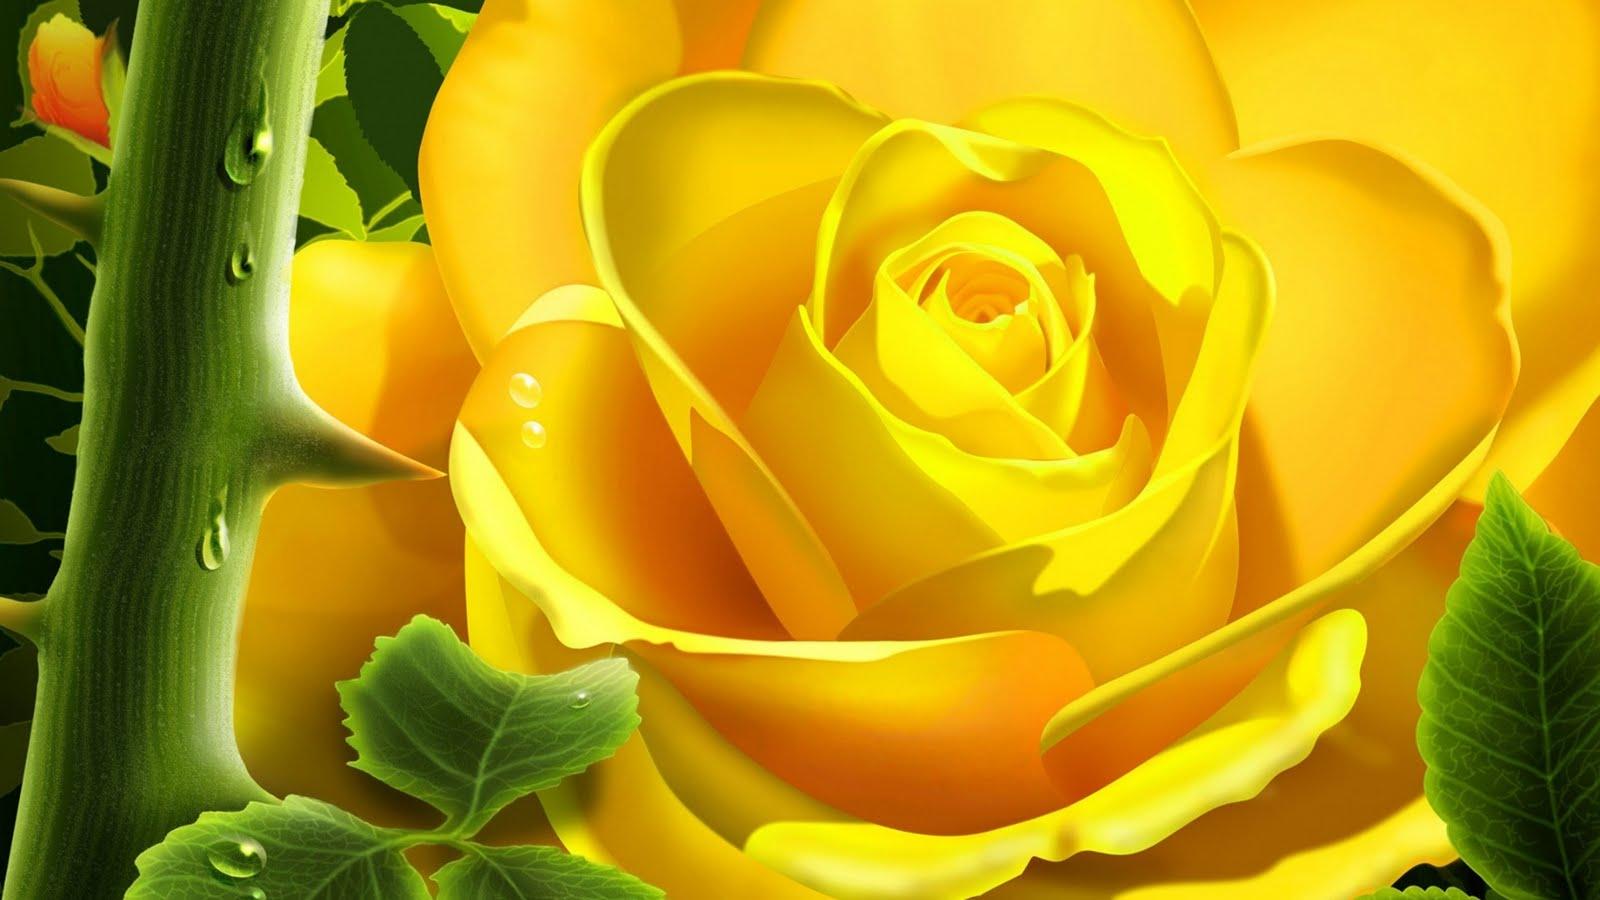 Yellow Rose Free Wallpaper For Download Desktop 19201080 Hdtv 1080p